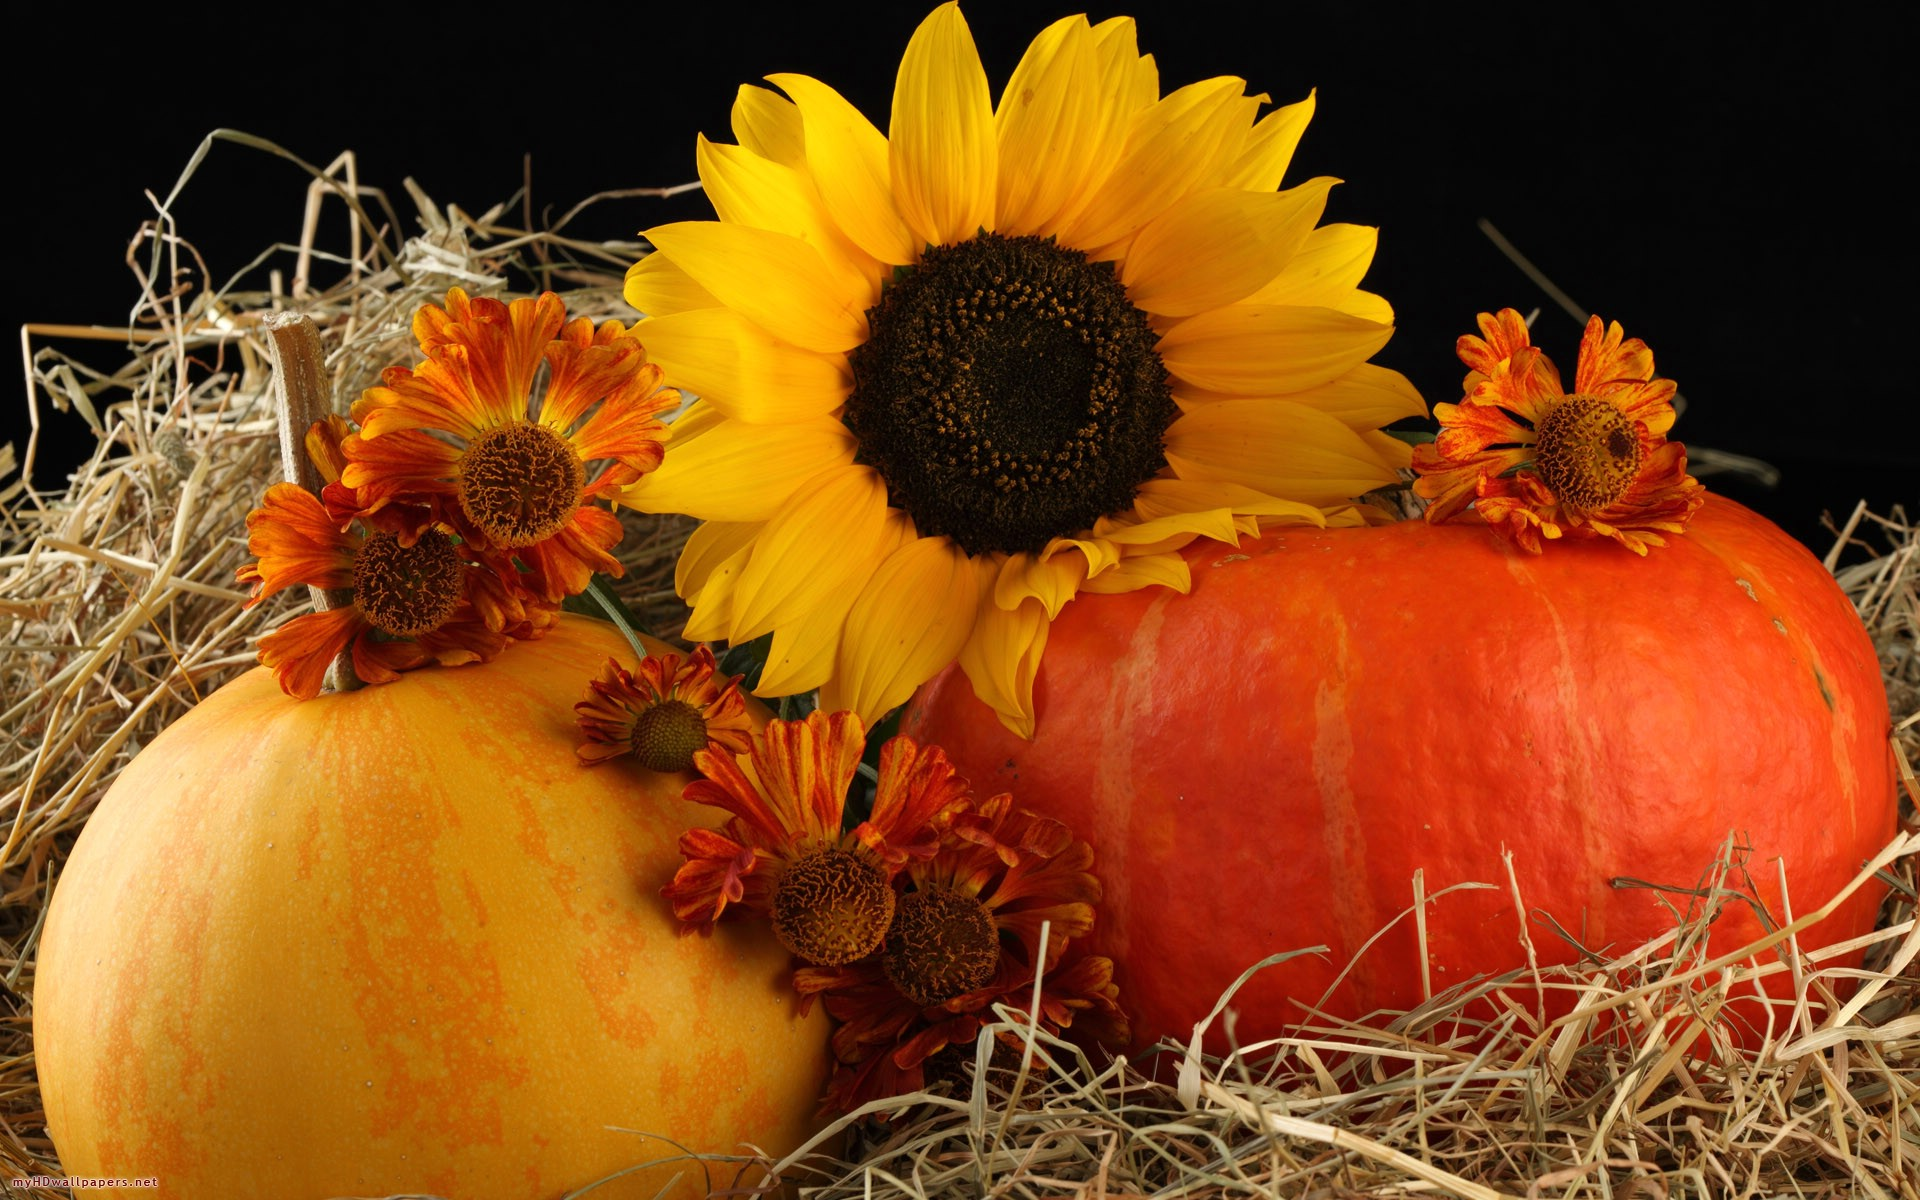 Free Pumpkin Wallpaper Backgrounds - WallpaperSafari